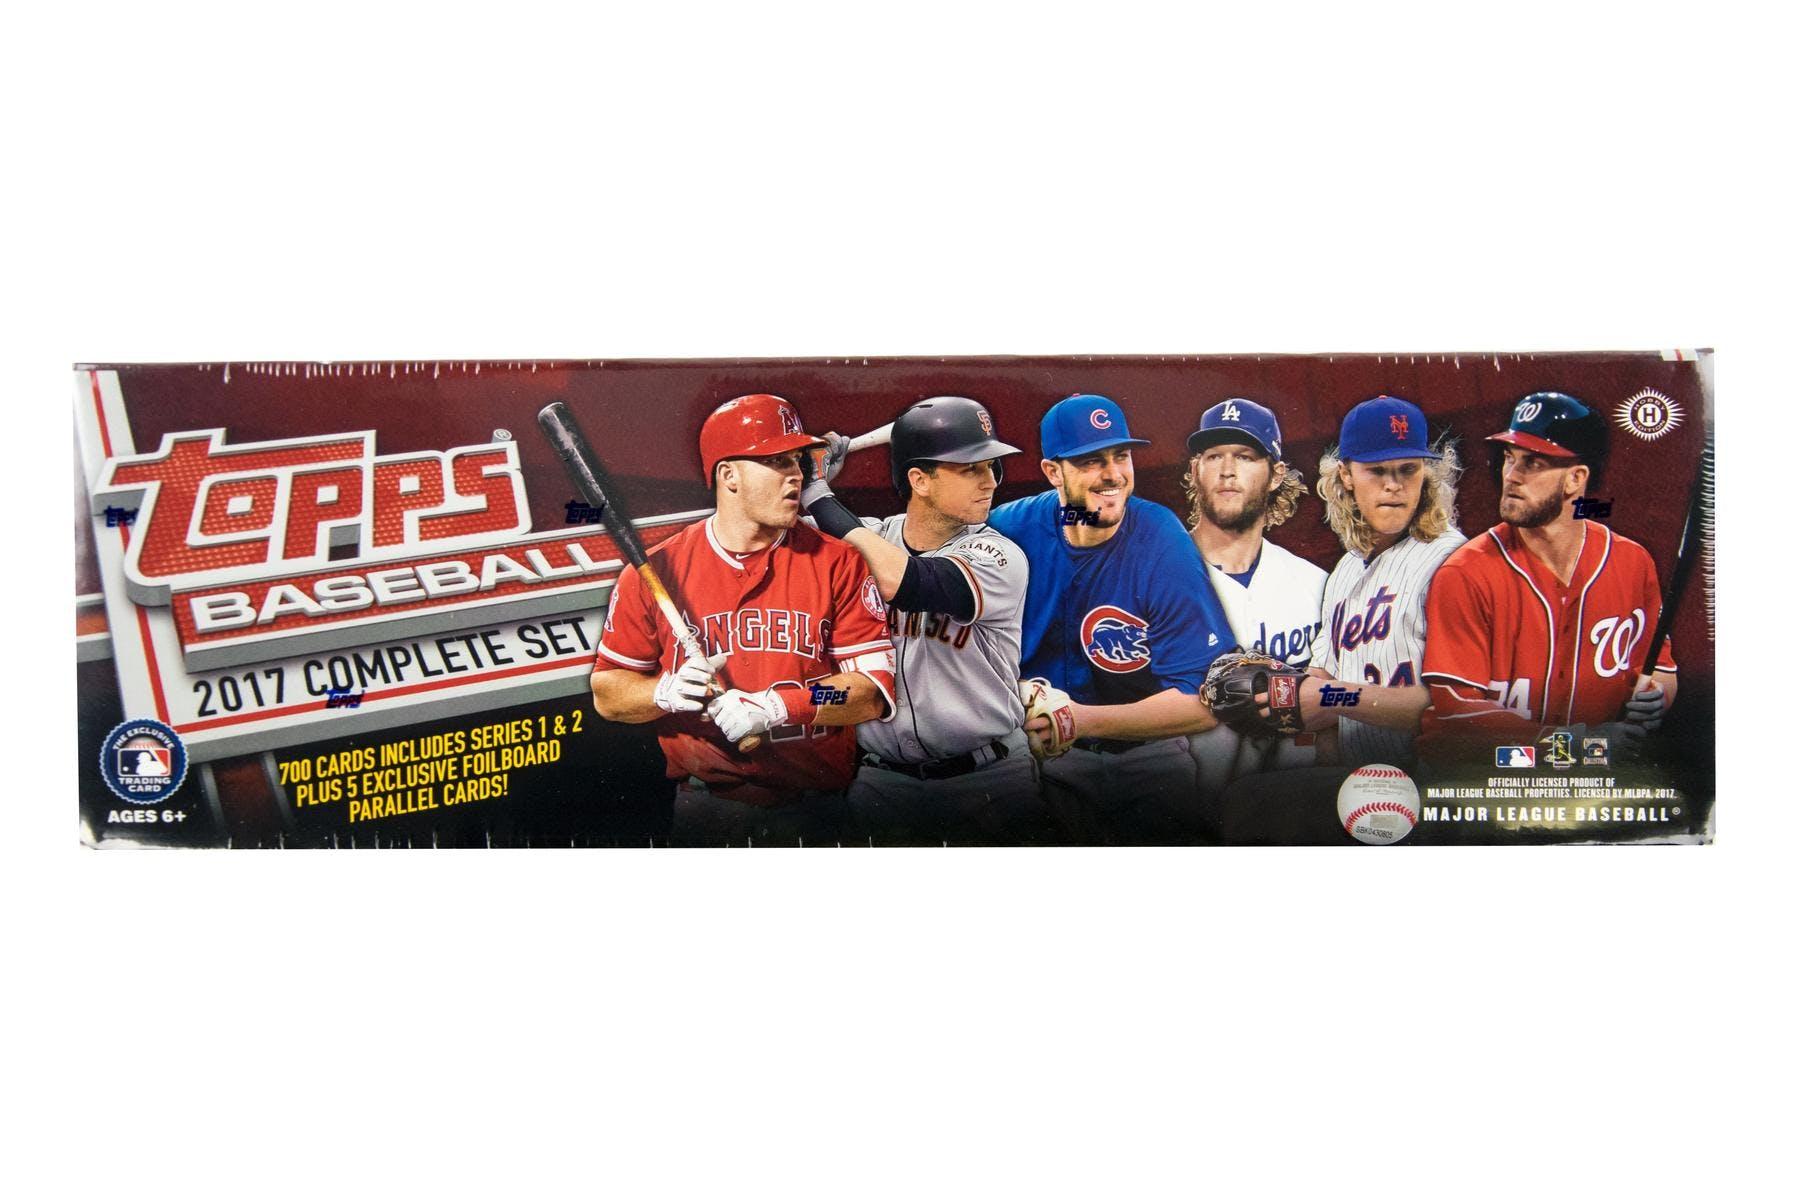 2017 Topps Factory Set Baseball Hobby Box Da Card World